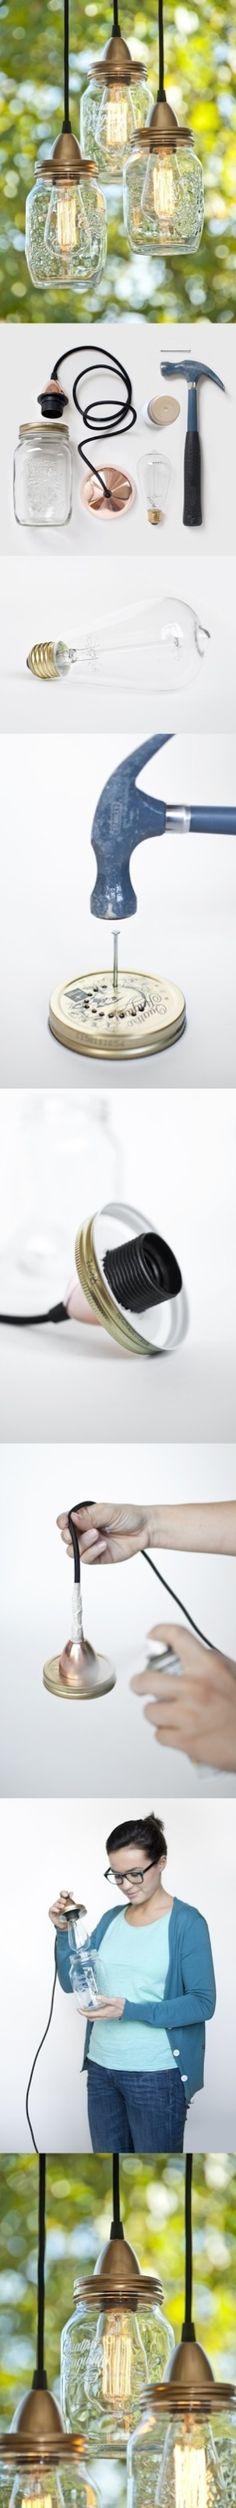 DIY Mason Jar Light by Hairstyle Tutorials